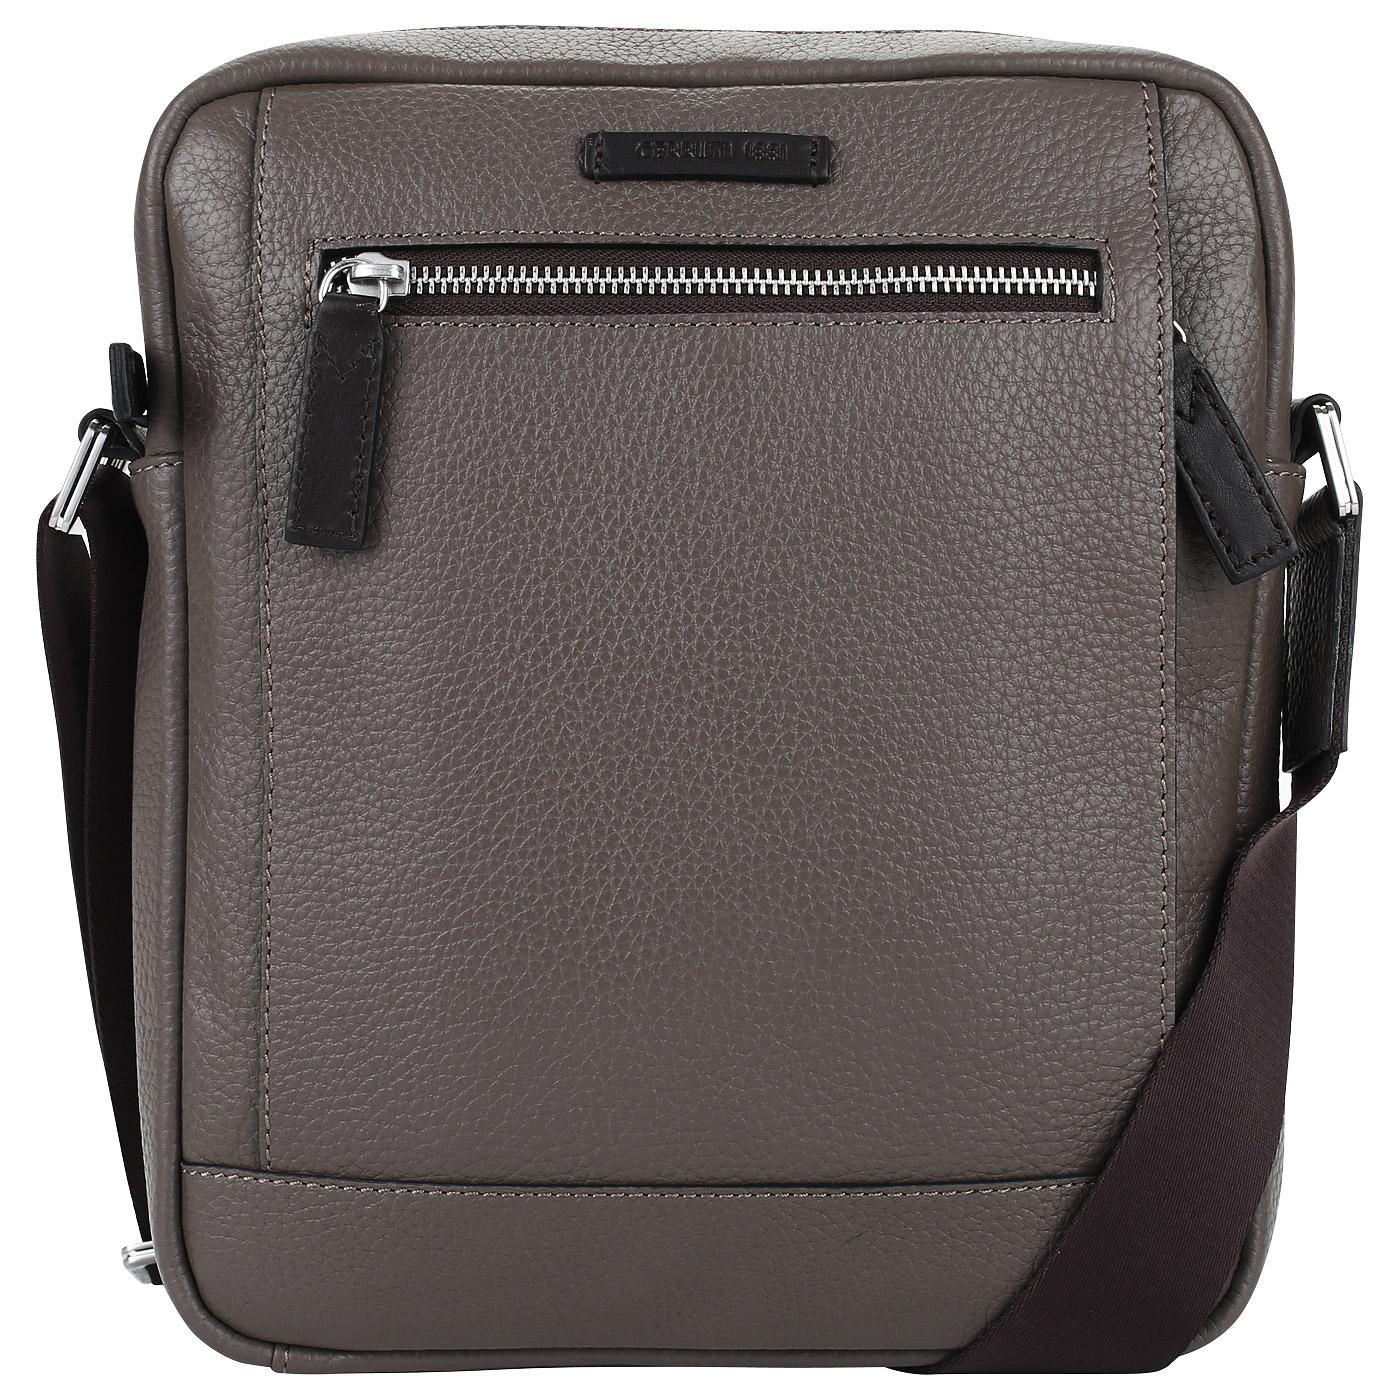 c59ef9844c54 Мужская сумка-планшет Cerruti 1881 Monaco CEBO02632M_taupe ...